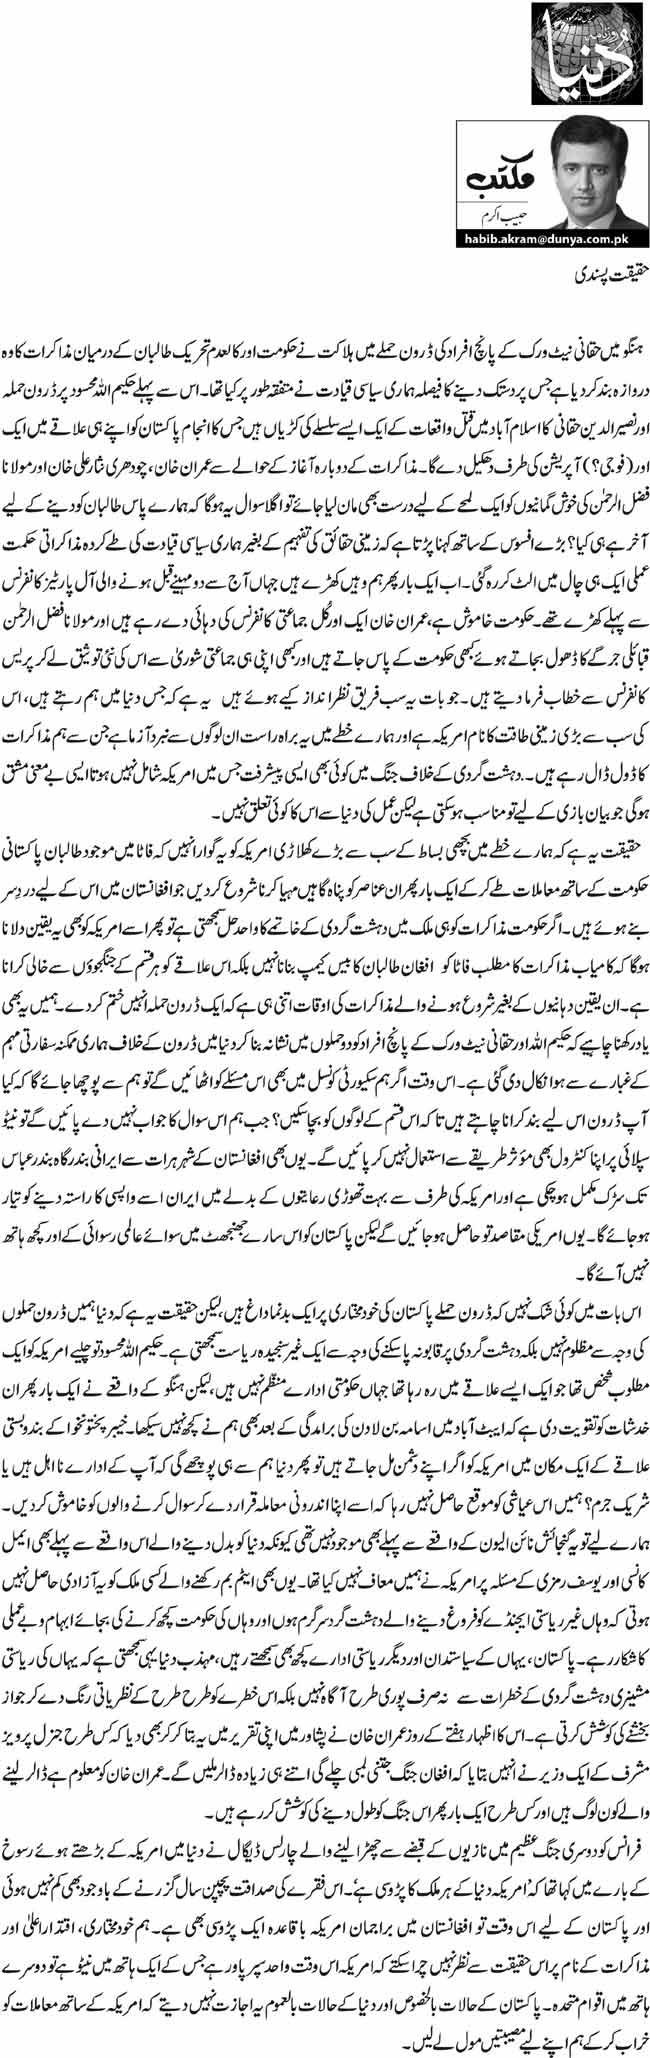 Haqiqat Pasandi - Habib Akram - 25th November 2013